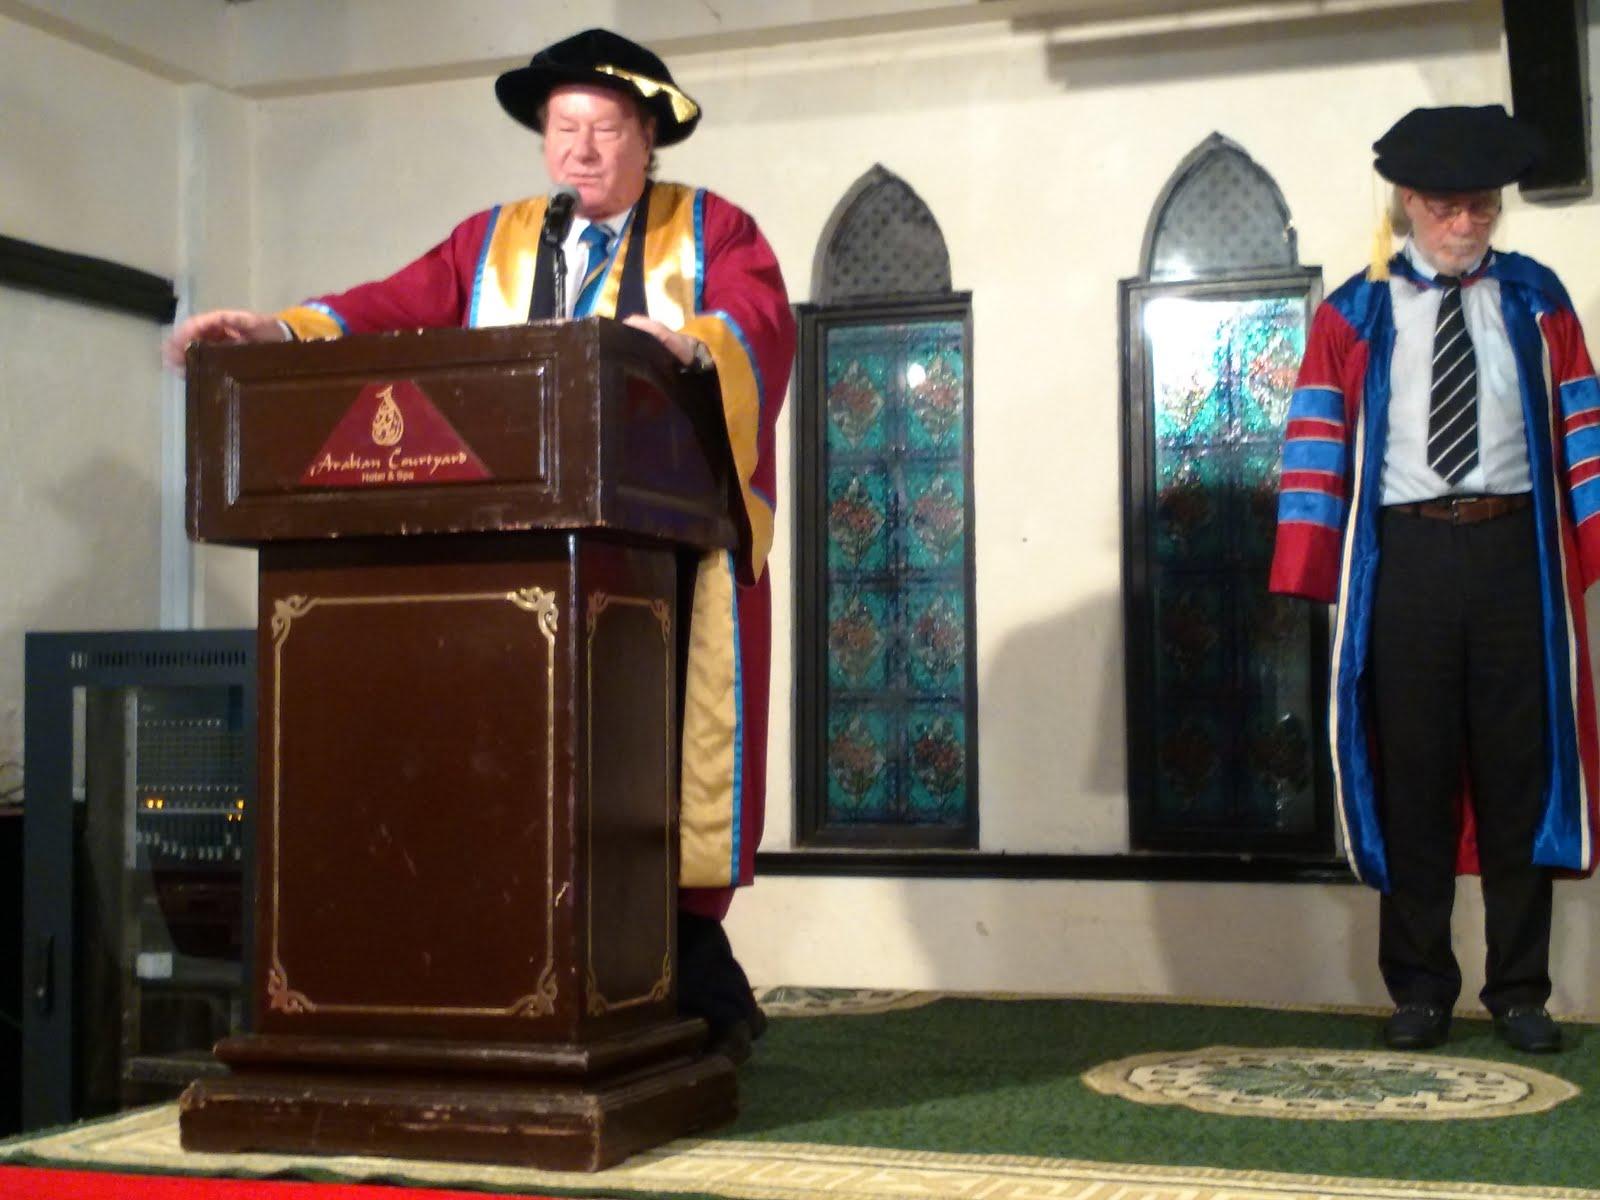 St Clements University 校長DAVID在二十周年慶典 致詞